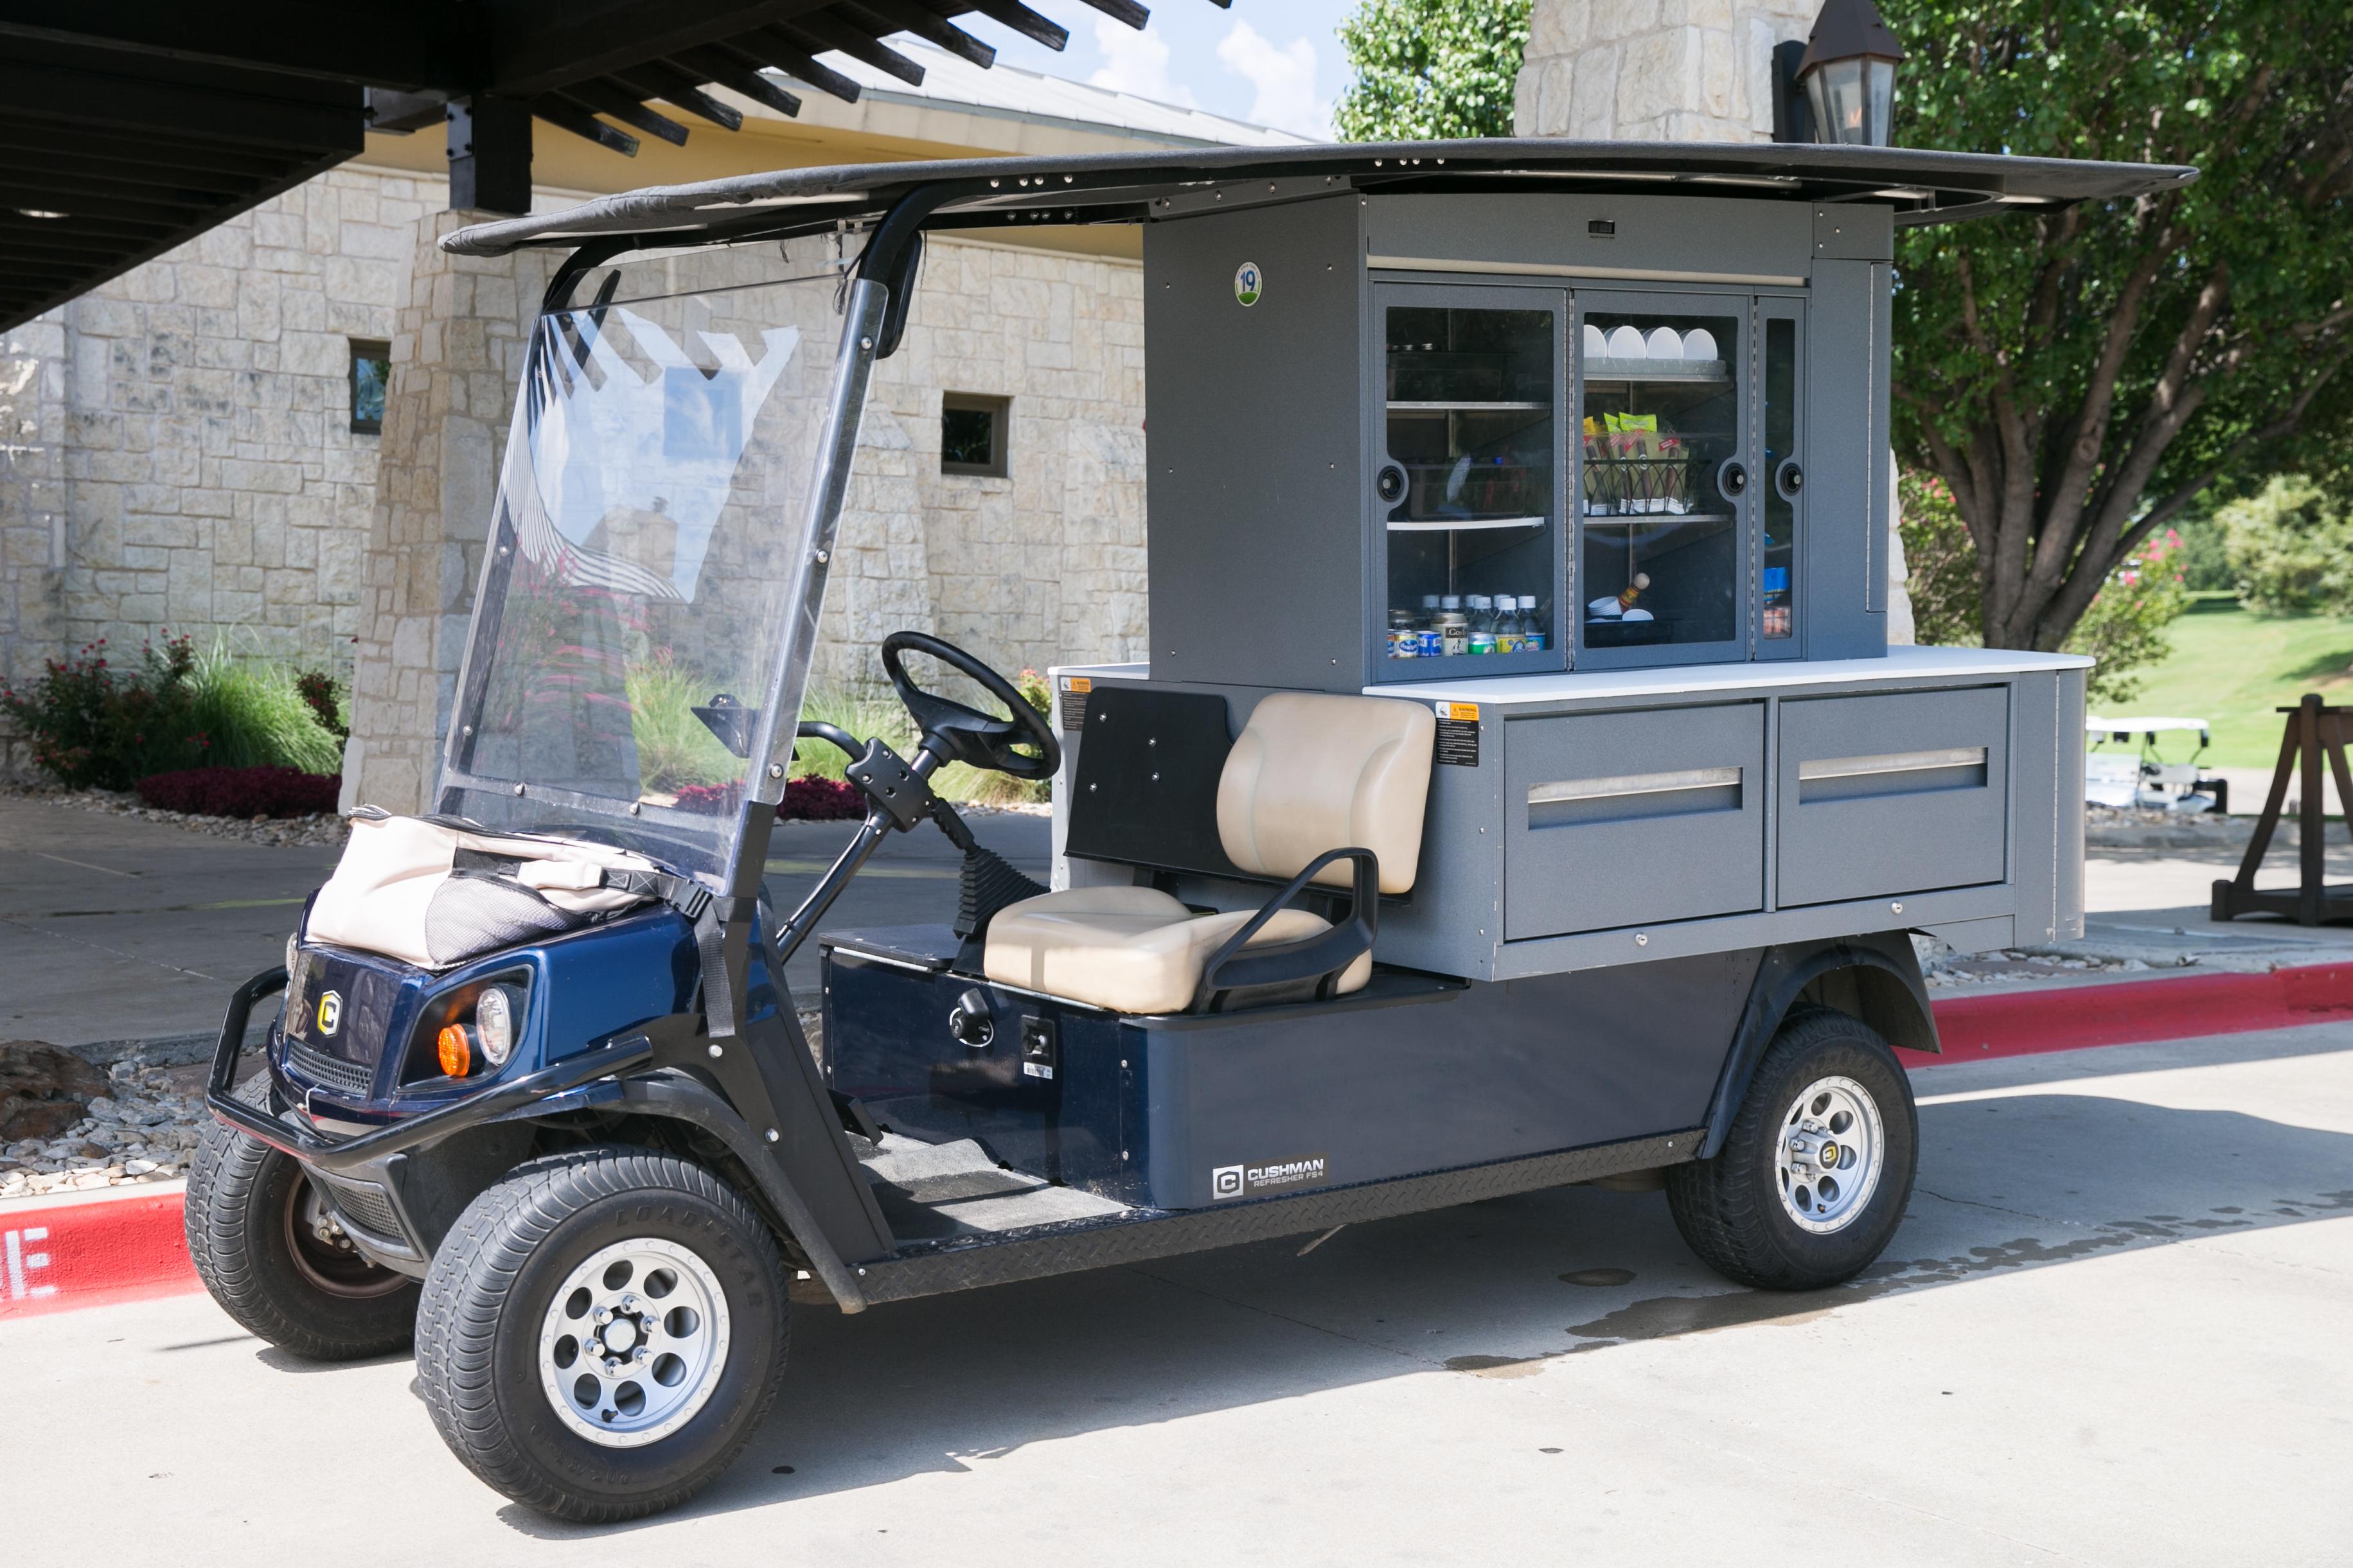 St. Basil the Great Golf Outing - Default Image of Beverage Cart Sponsor